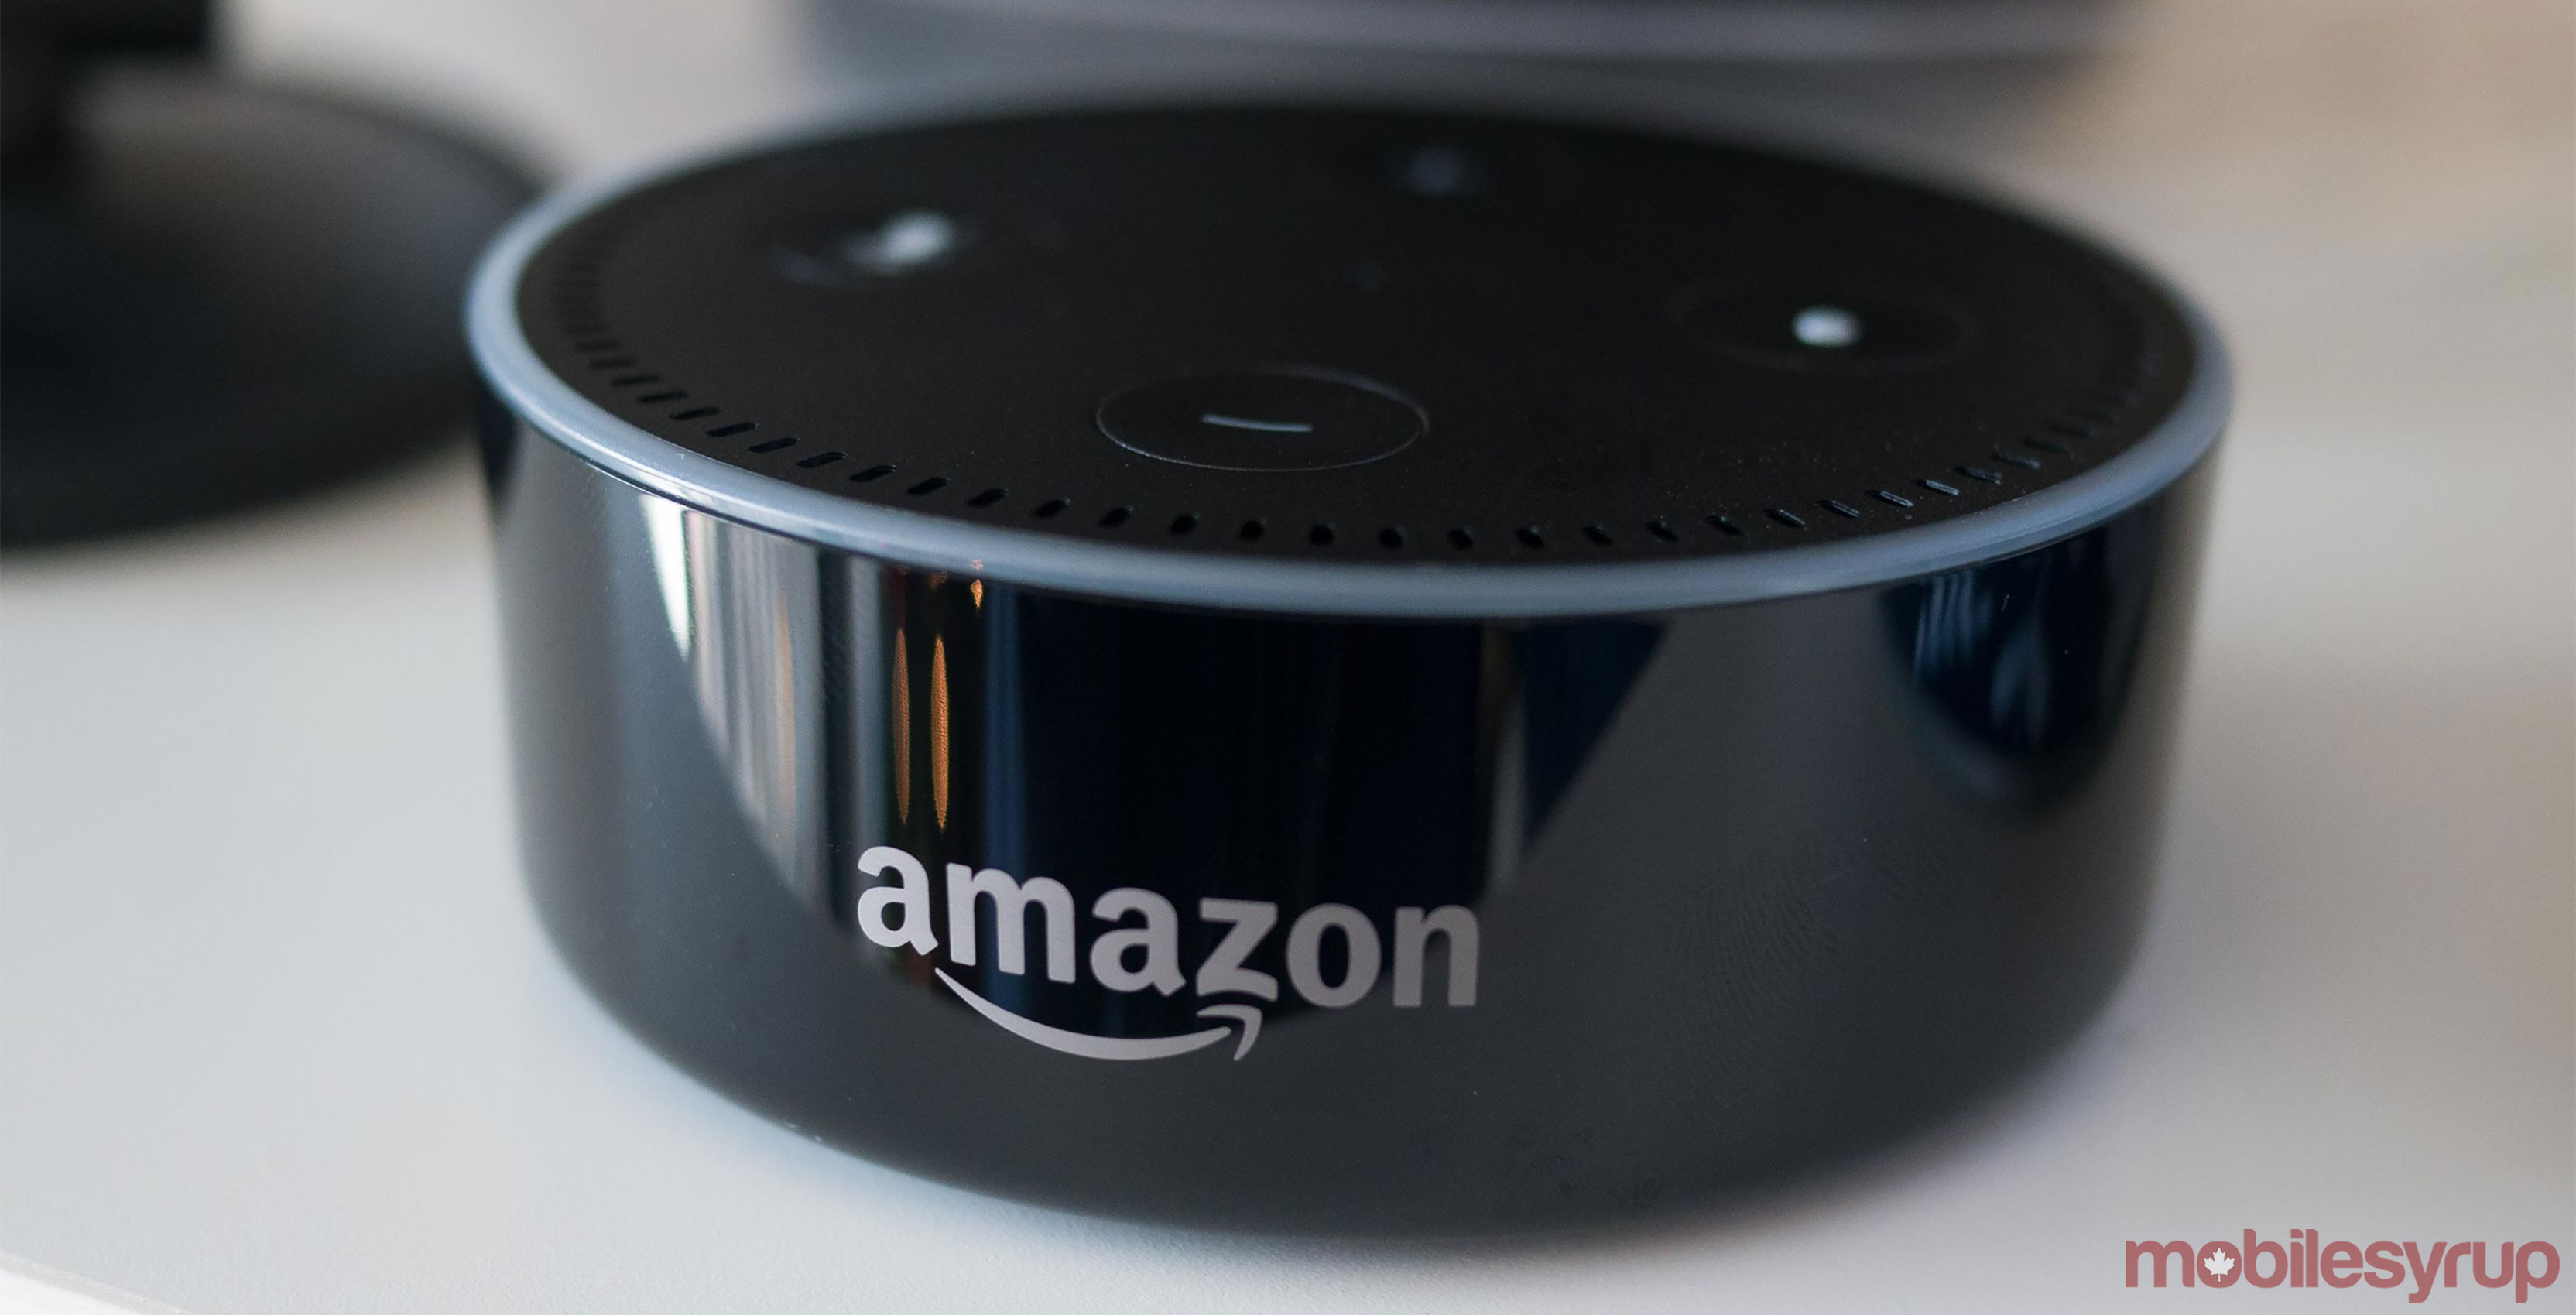 BlackBerry is working on an enterprise-focused Alexa-enabled device